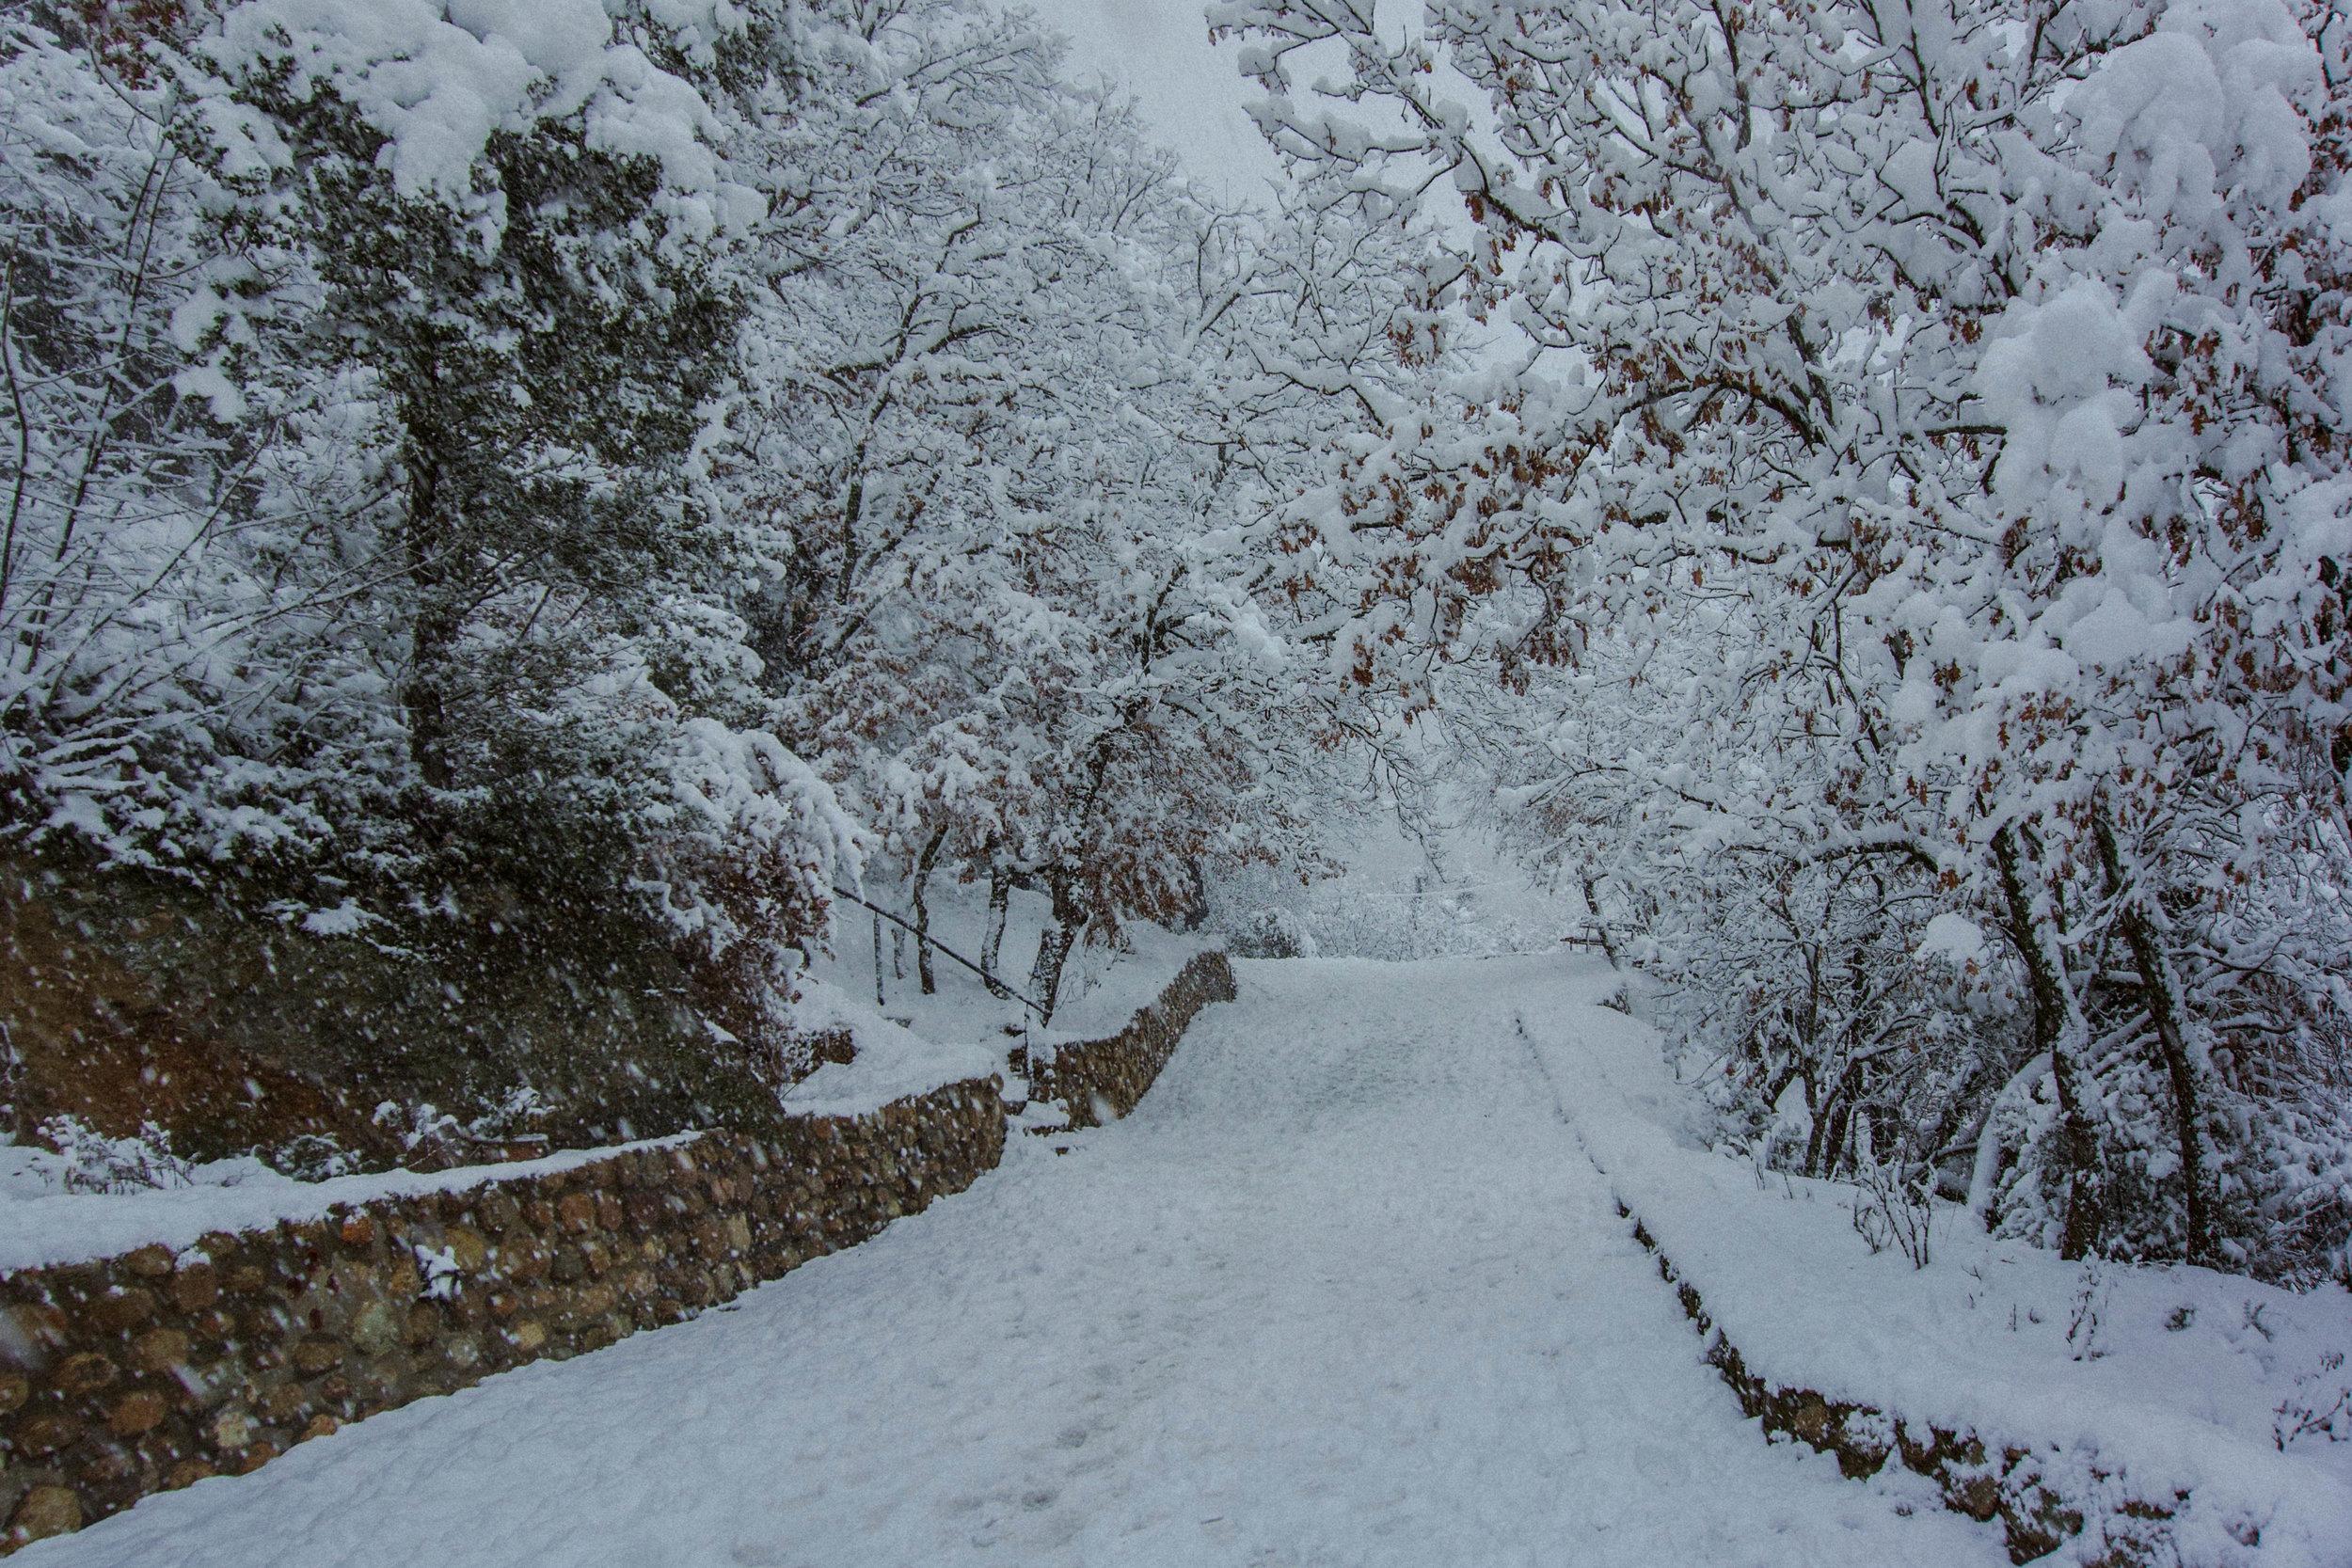 Meteora_01_Winterwind.JPG